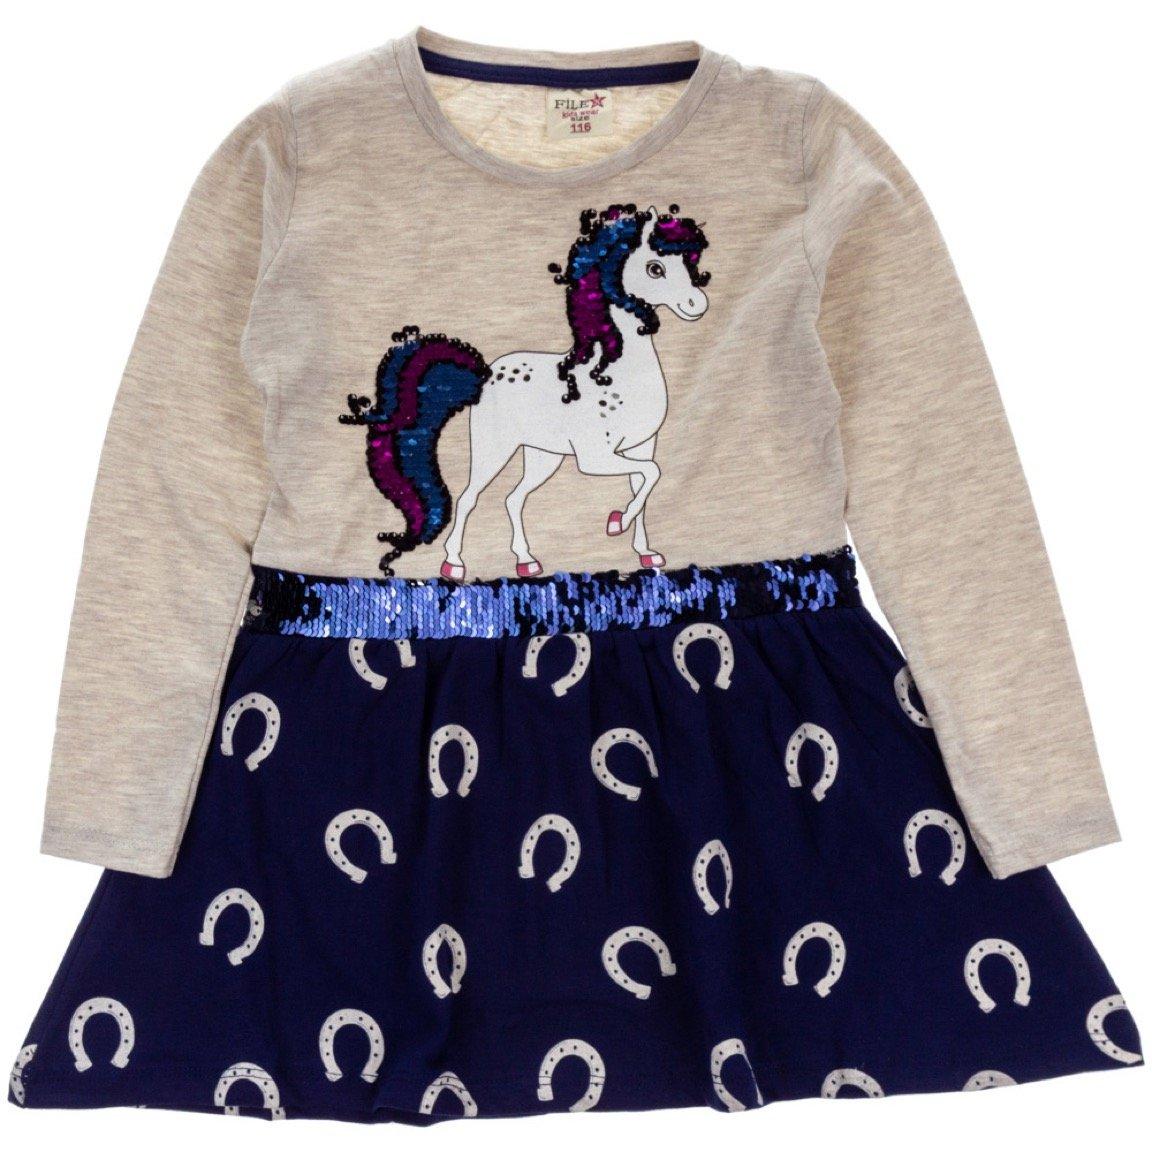 File παιδικό εποχιακό φόρεμα «The Proud Unicorn»